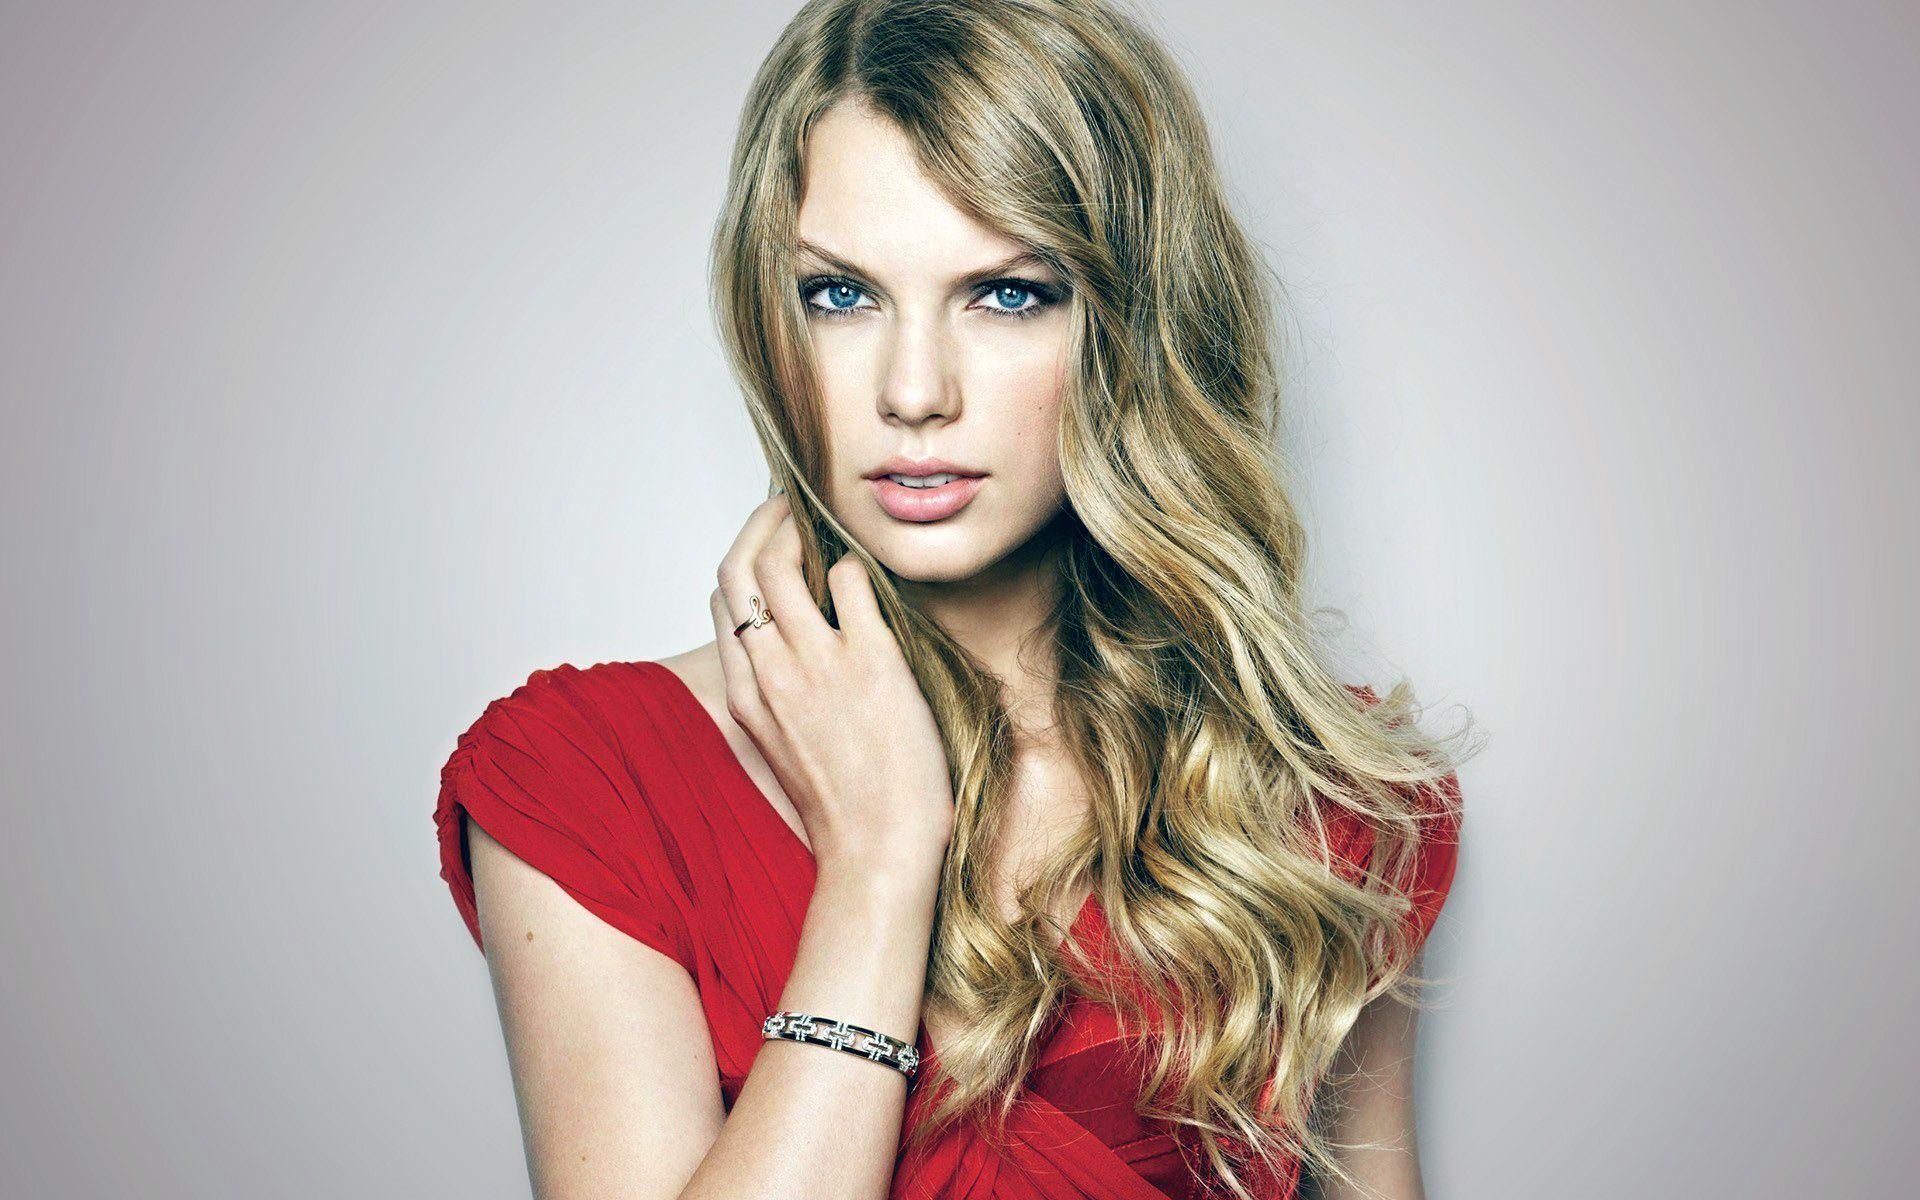 Taylor Swift HD 2017 Wallpapers 1920x1200